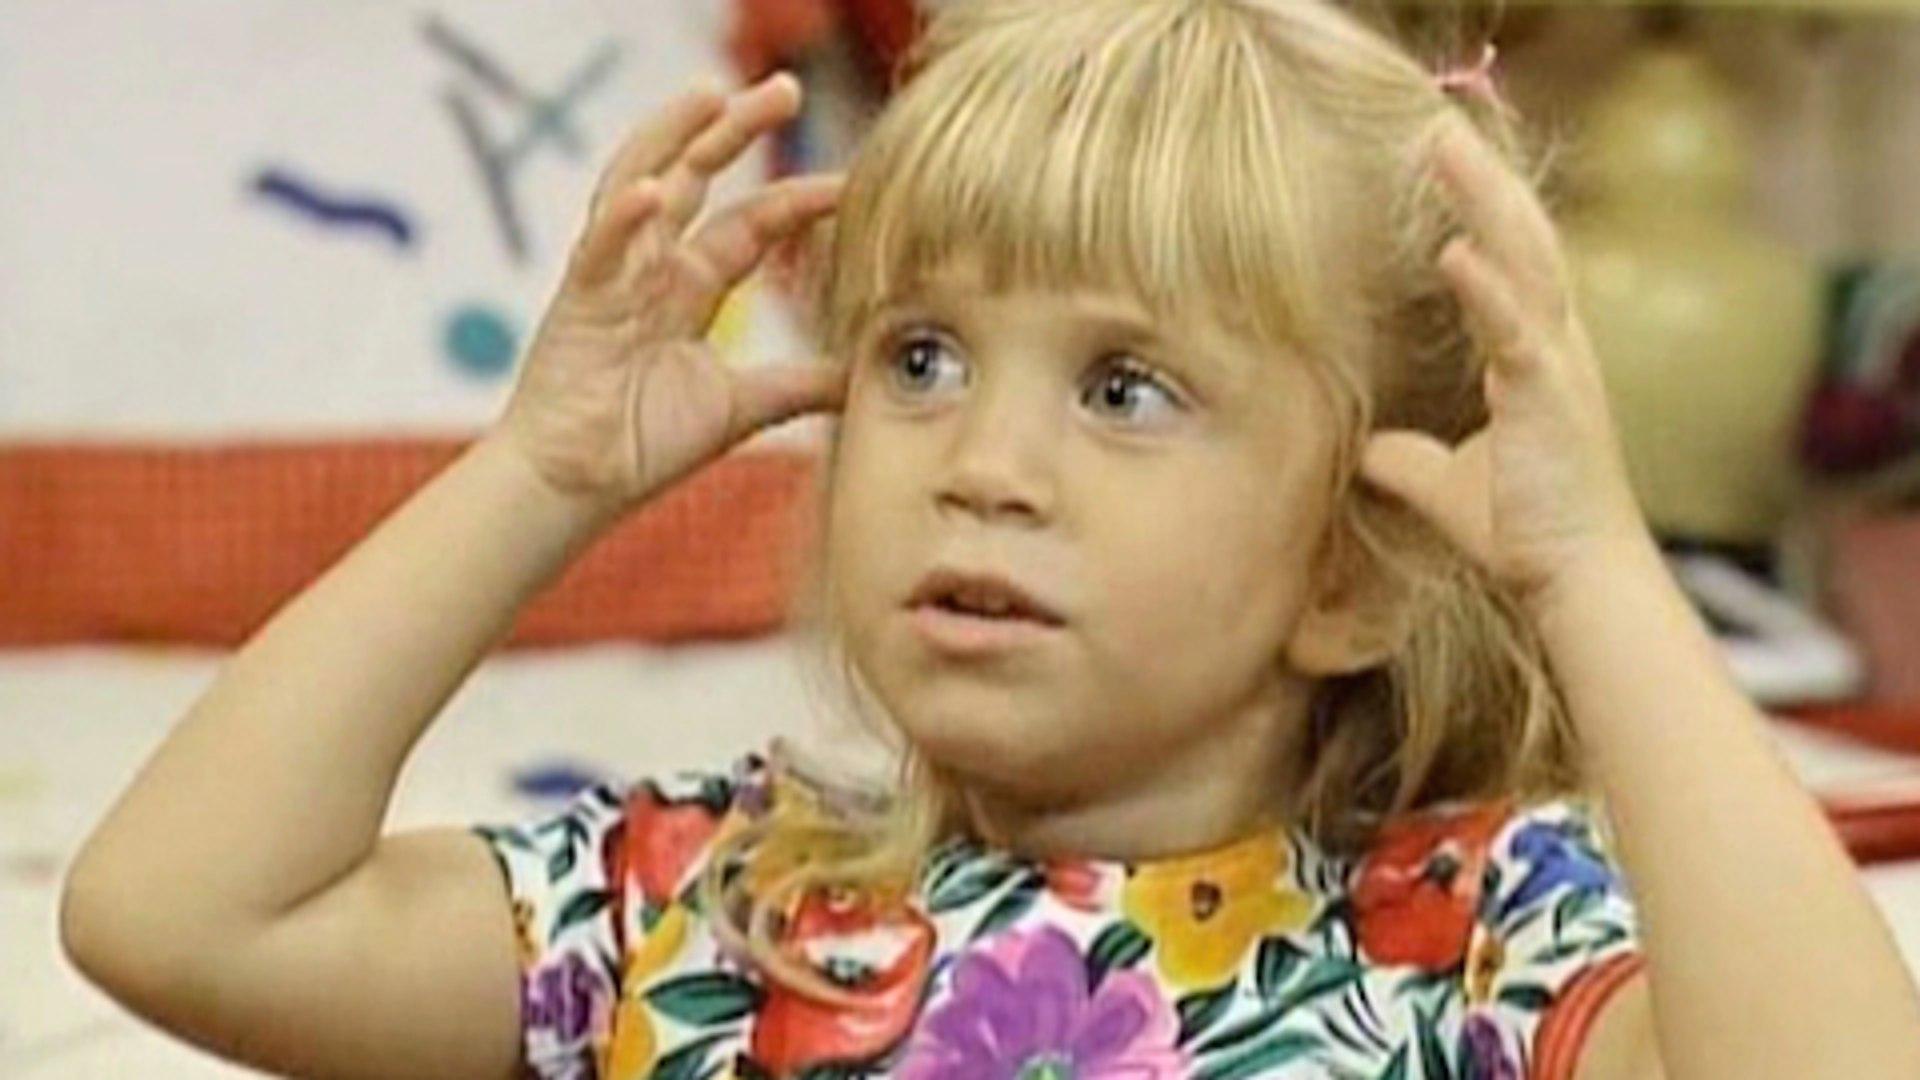 Top 10 Live-Action TV Kids